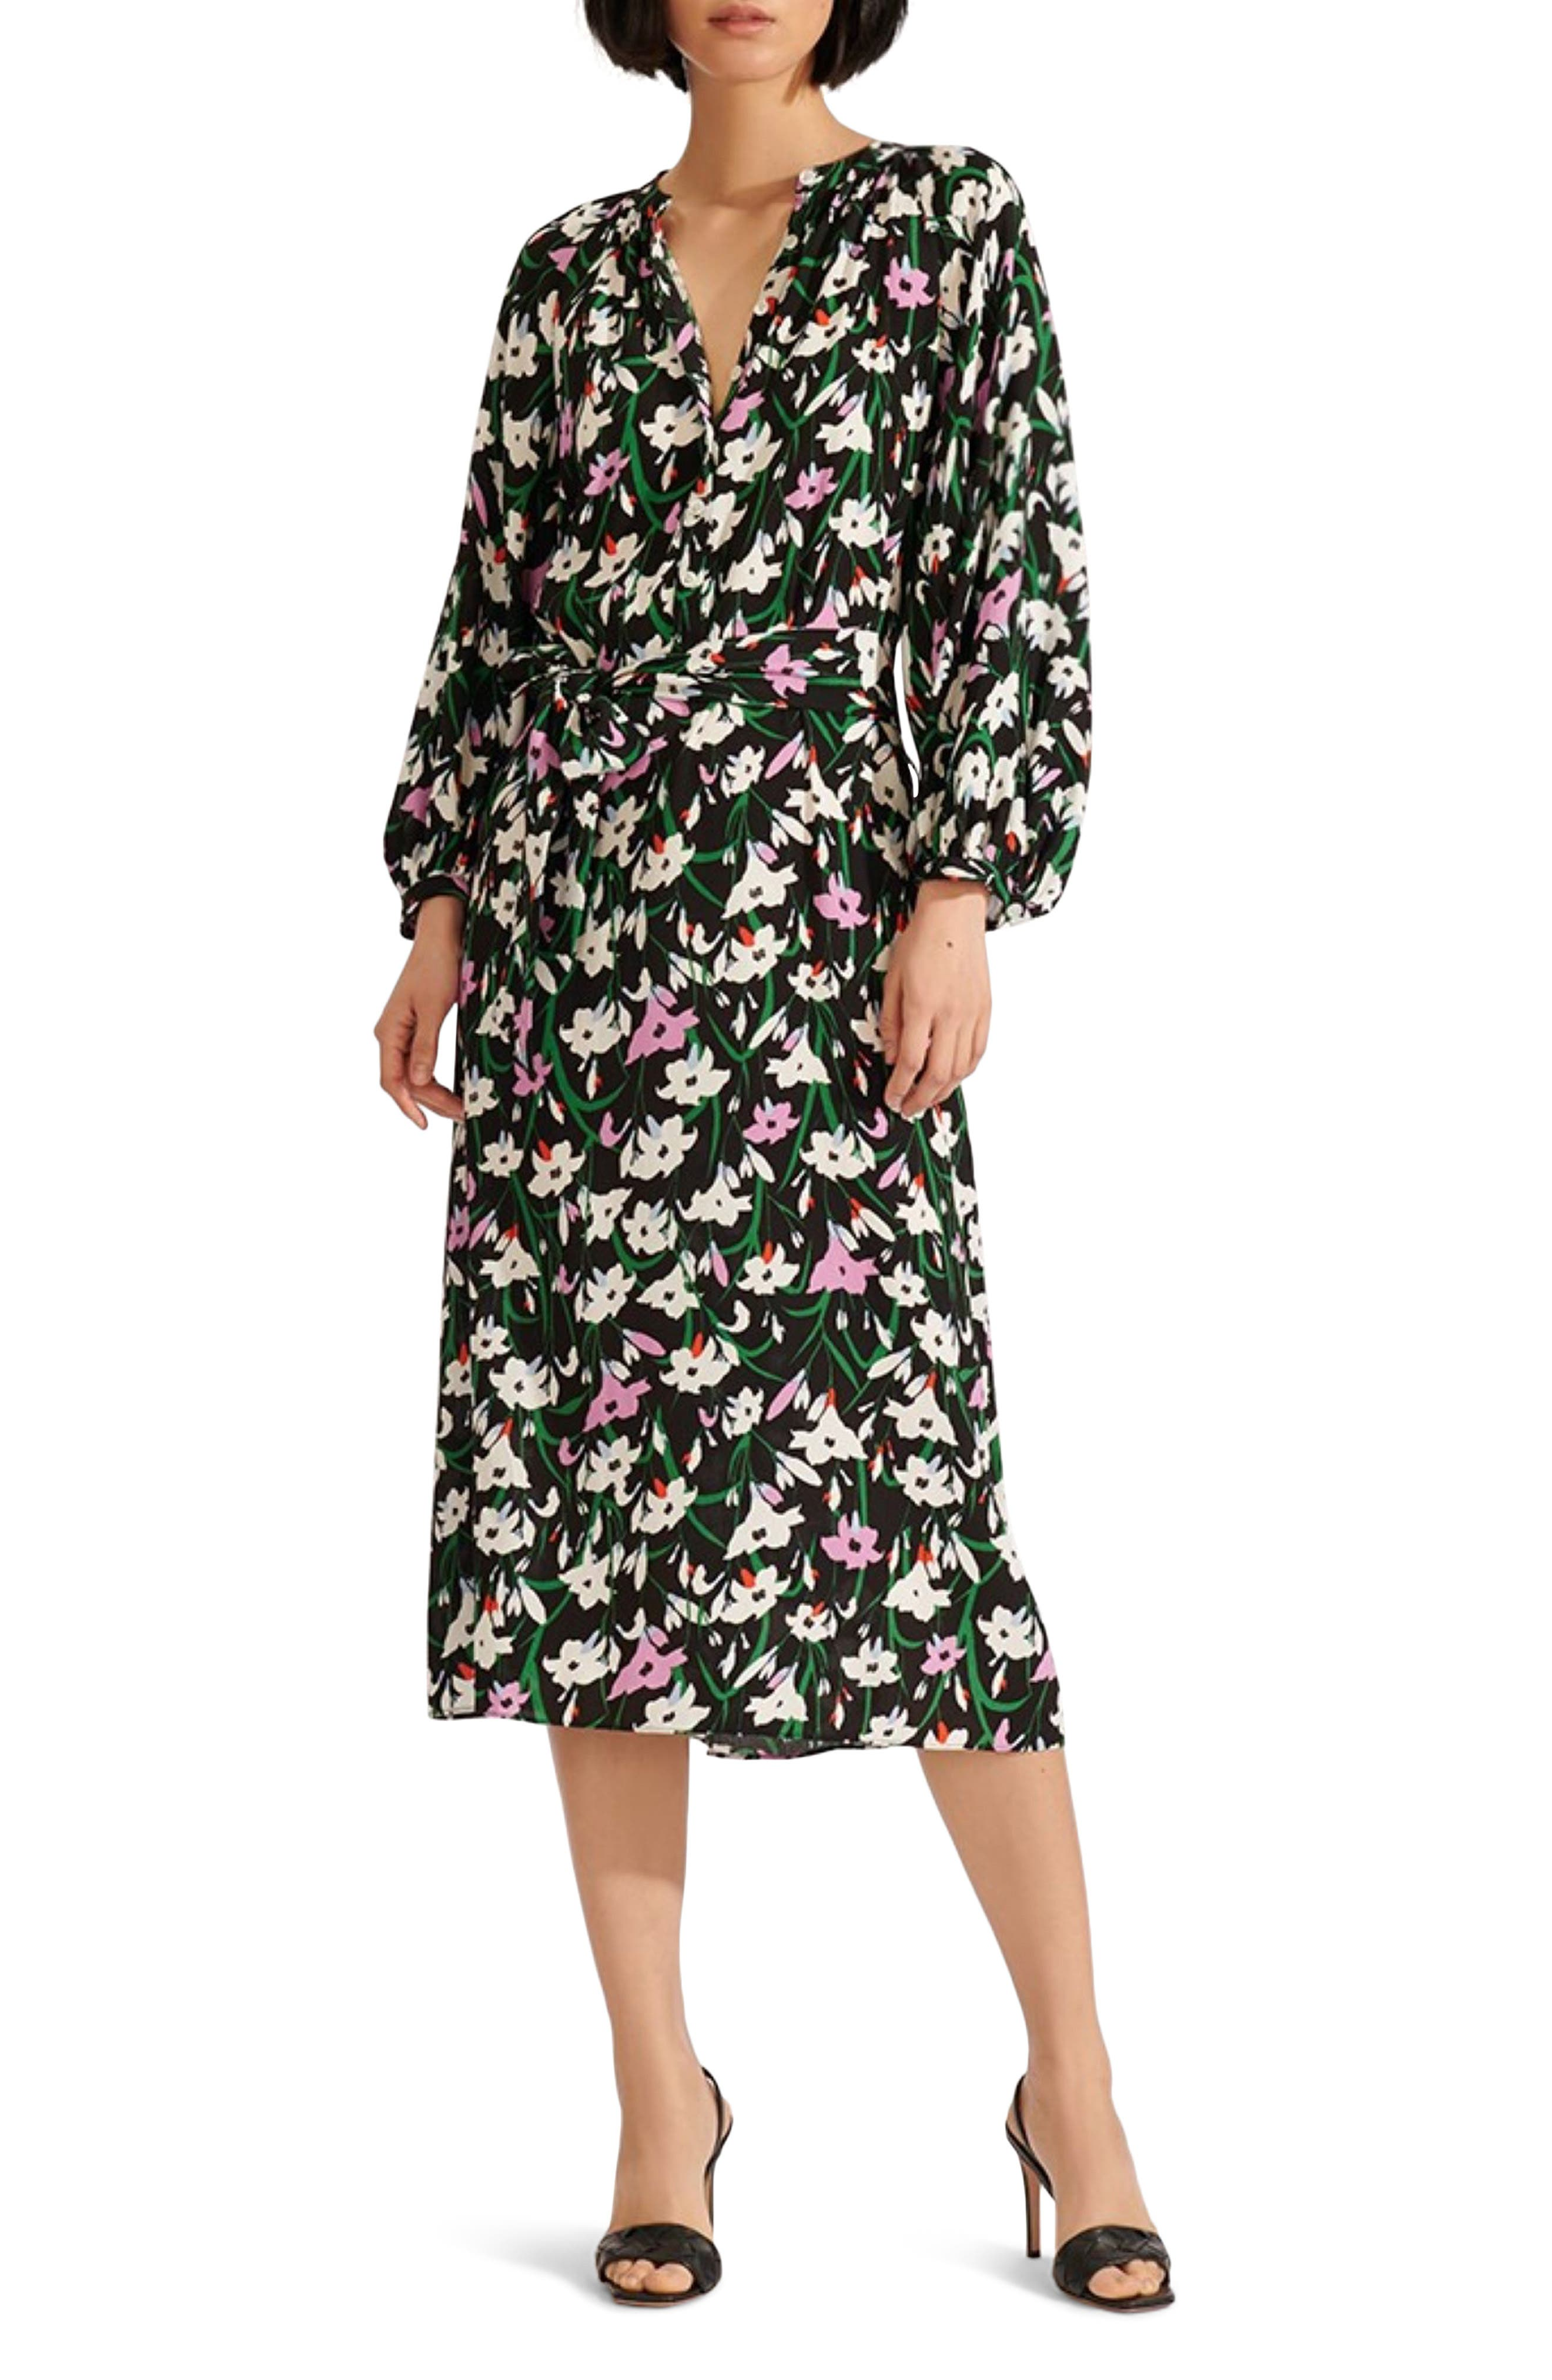 Image of VERONICA BEARD Cecilia Floral Print Dress